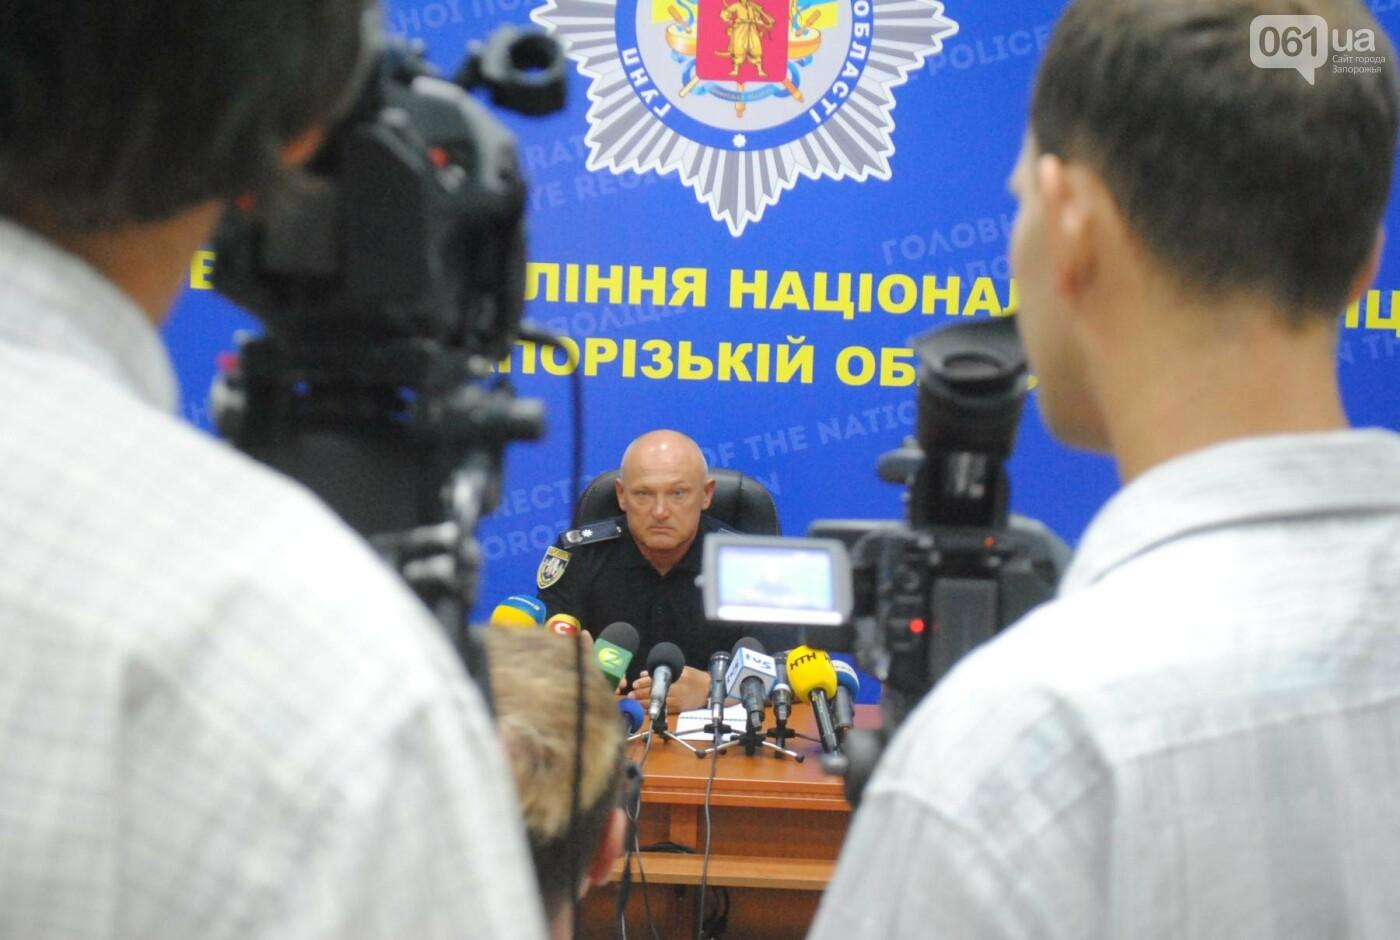 За Олешко следили два дня: в полиции рассказали подробности покушения в Бердянске, - ФОТО, фото-1